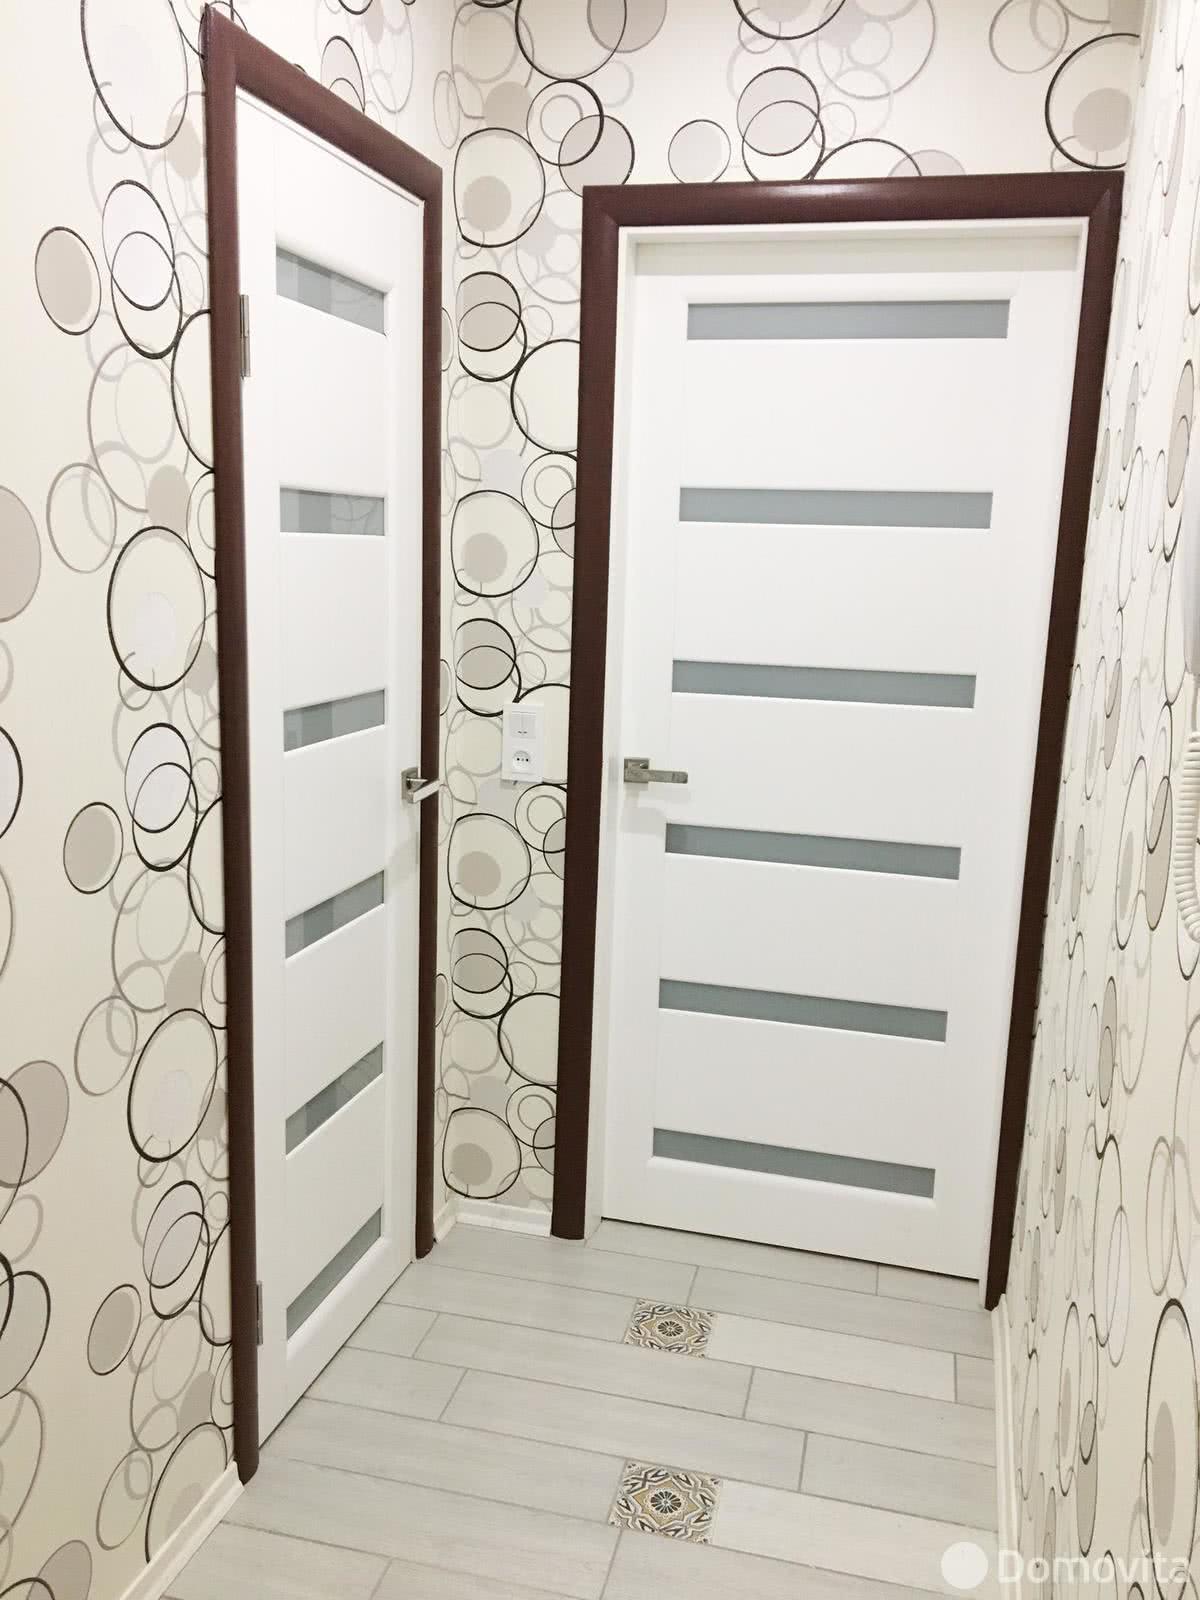 Аренда 1-комнатной квартиры на сутки в Минске, ул. Веры Хоружей, д. 5 - фото 6